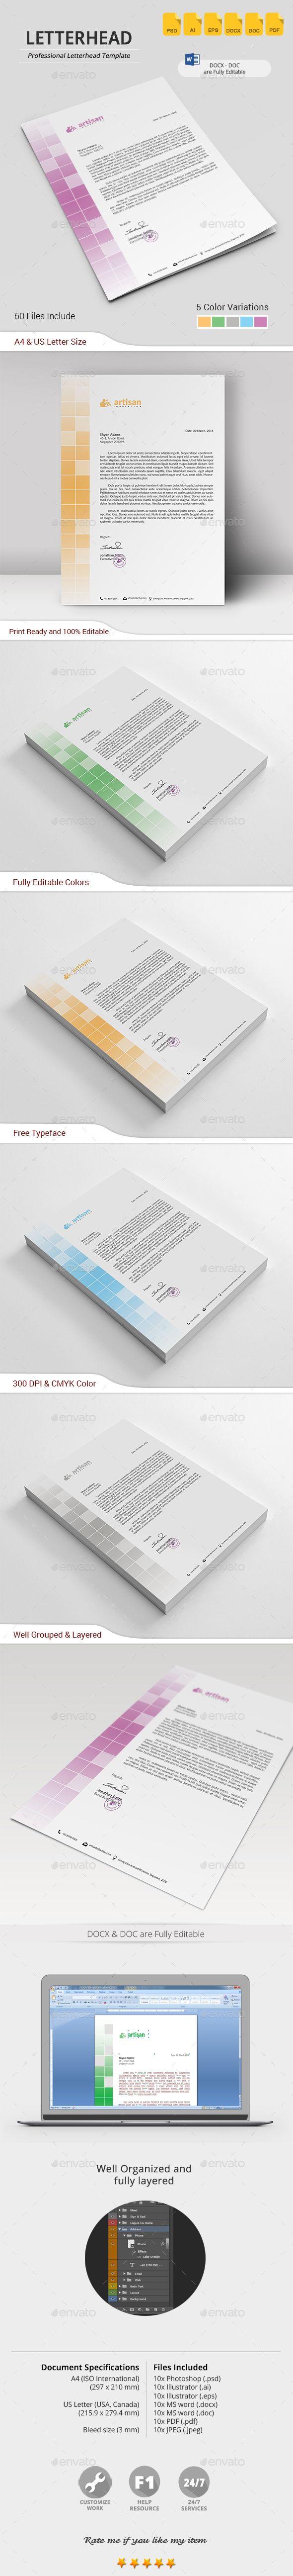 #Letterhead - #Stationery Print #Templates Download here: https://graphicriver.net/item/letterhead/19500468?ref=alena994